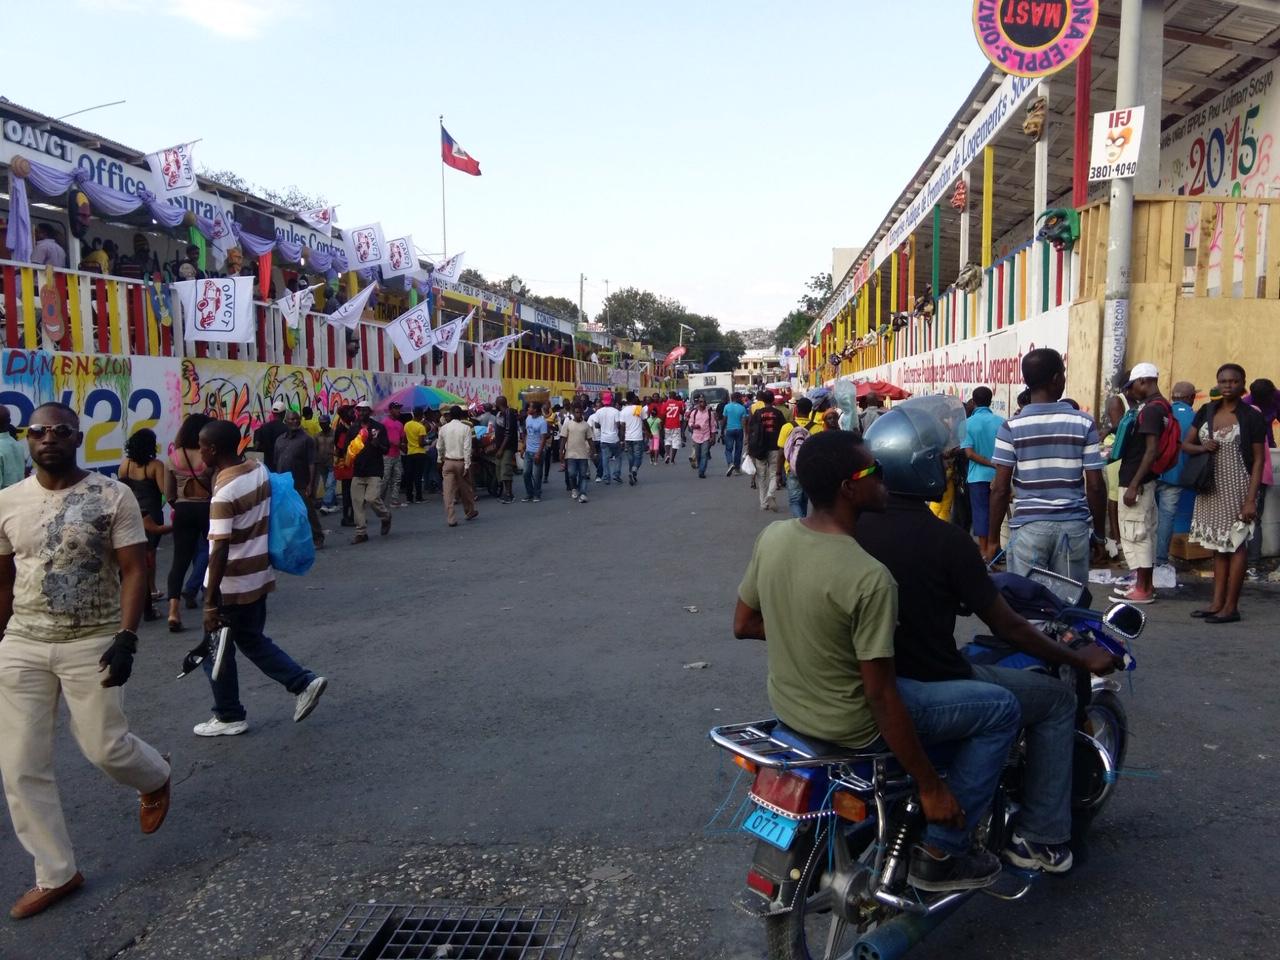 Haitian Carnival, Port-au-Prince (2015)